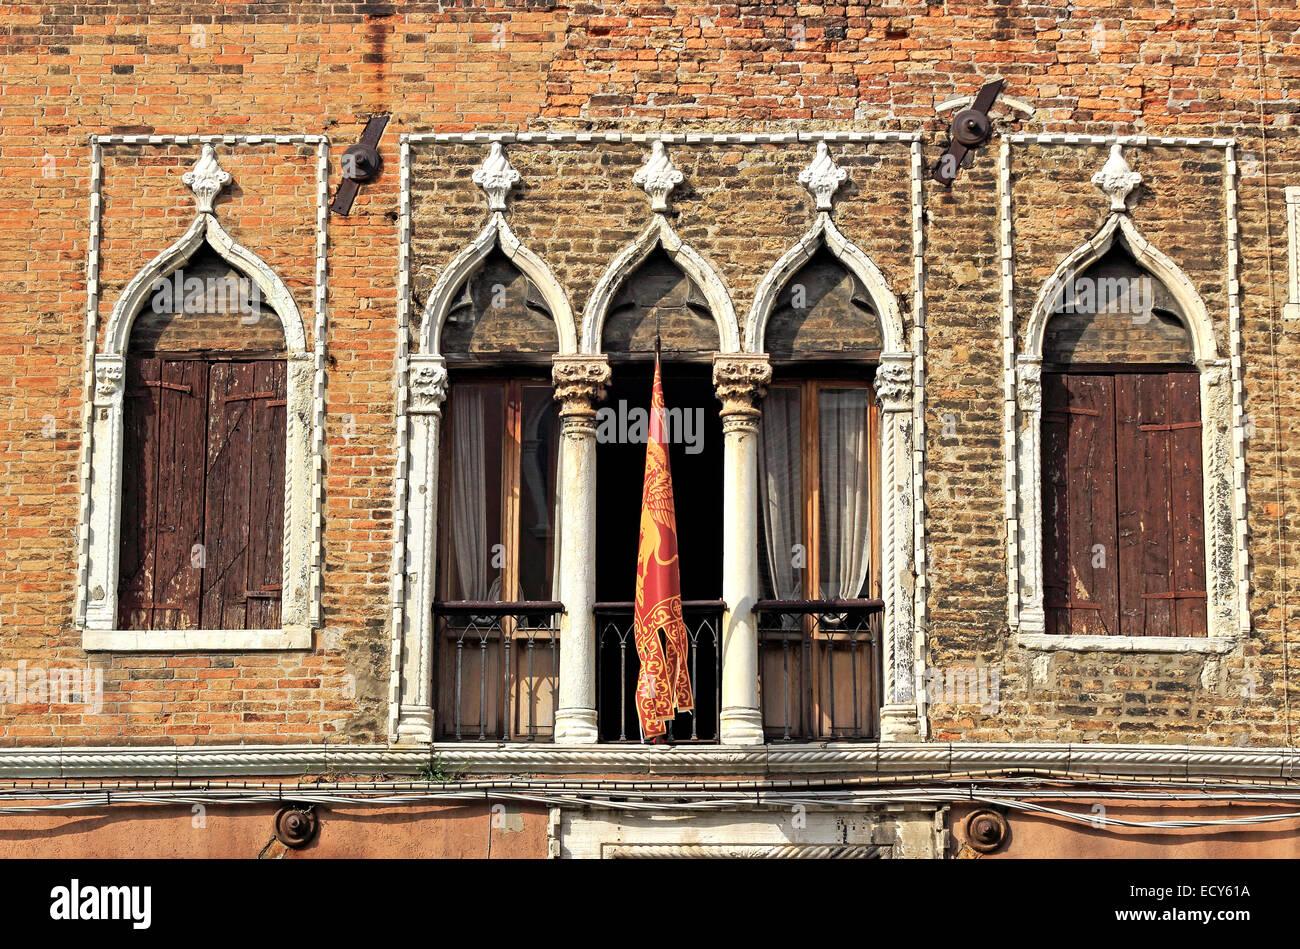 Palladian windows with Moorish influence, Murano, Venice, Veneto, Italy - Stock Image